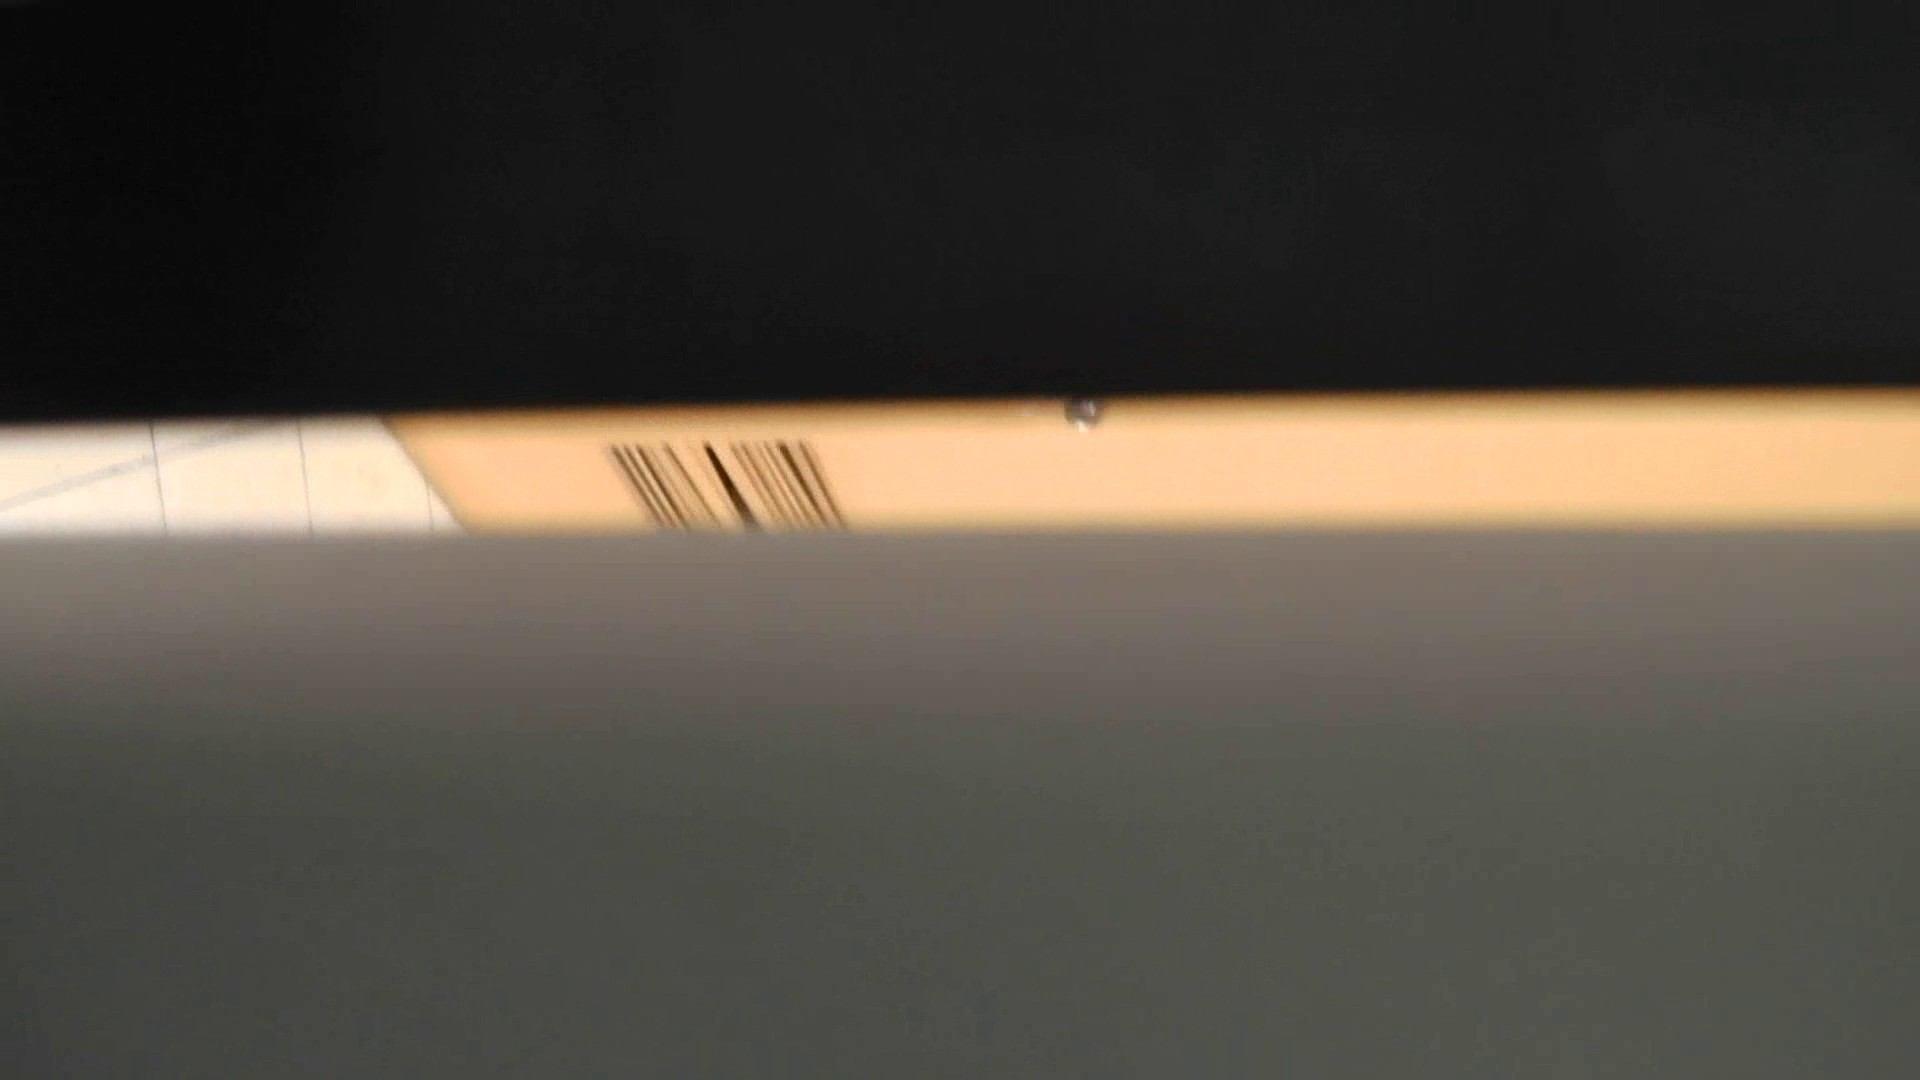 vol.25三十時間潜り、一つしか出会えない完璧桃尻編 byお銀 洗面所   OLの実態  92pic 4